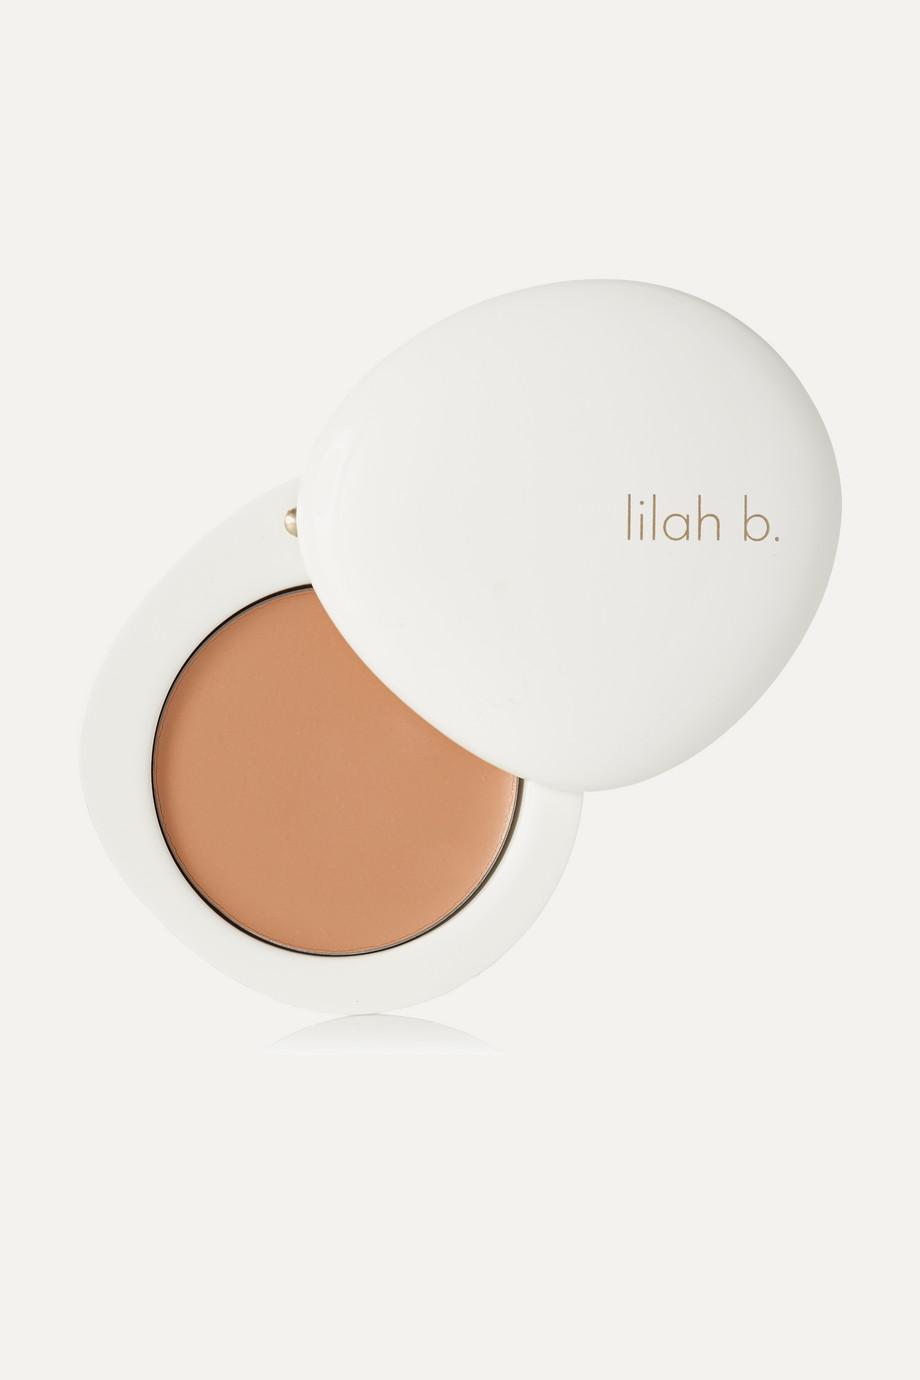 Lilah B. Virtuous Veil™ Concealer & Eye Primer - b.radiant